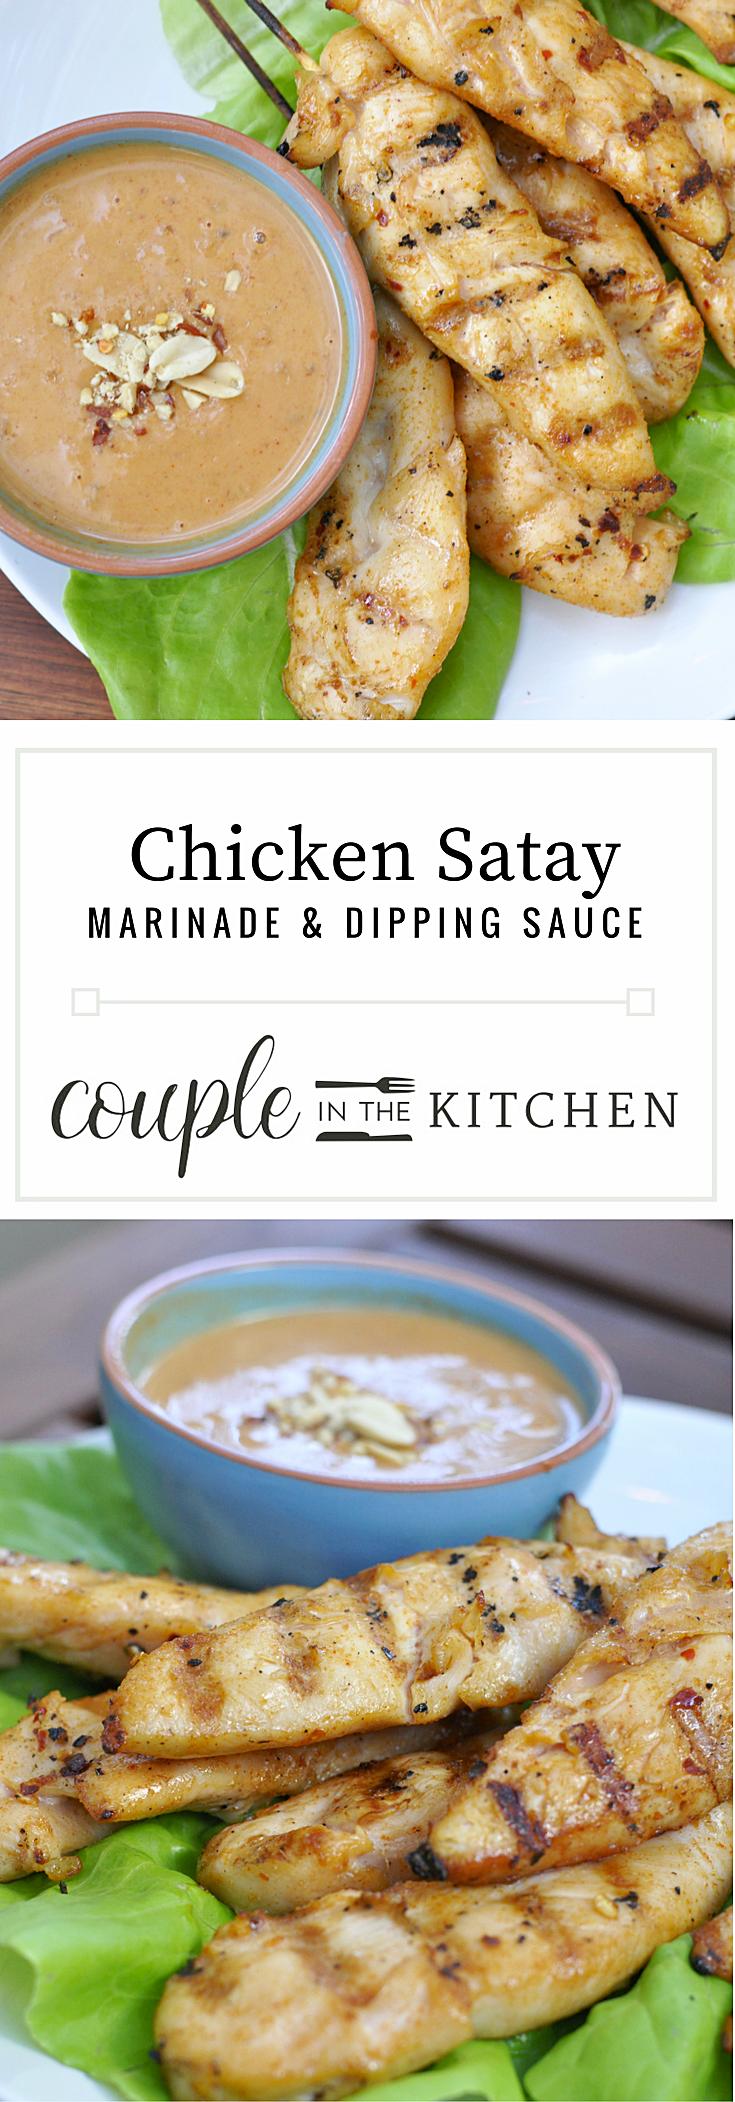 Chicken Satay Recipe   coupleinthekitchen.com